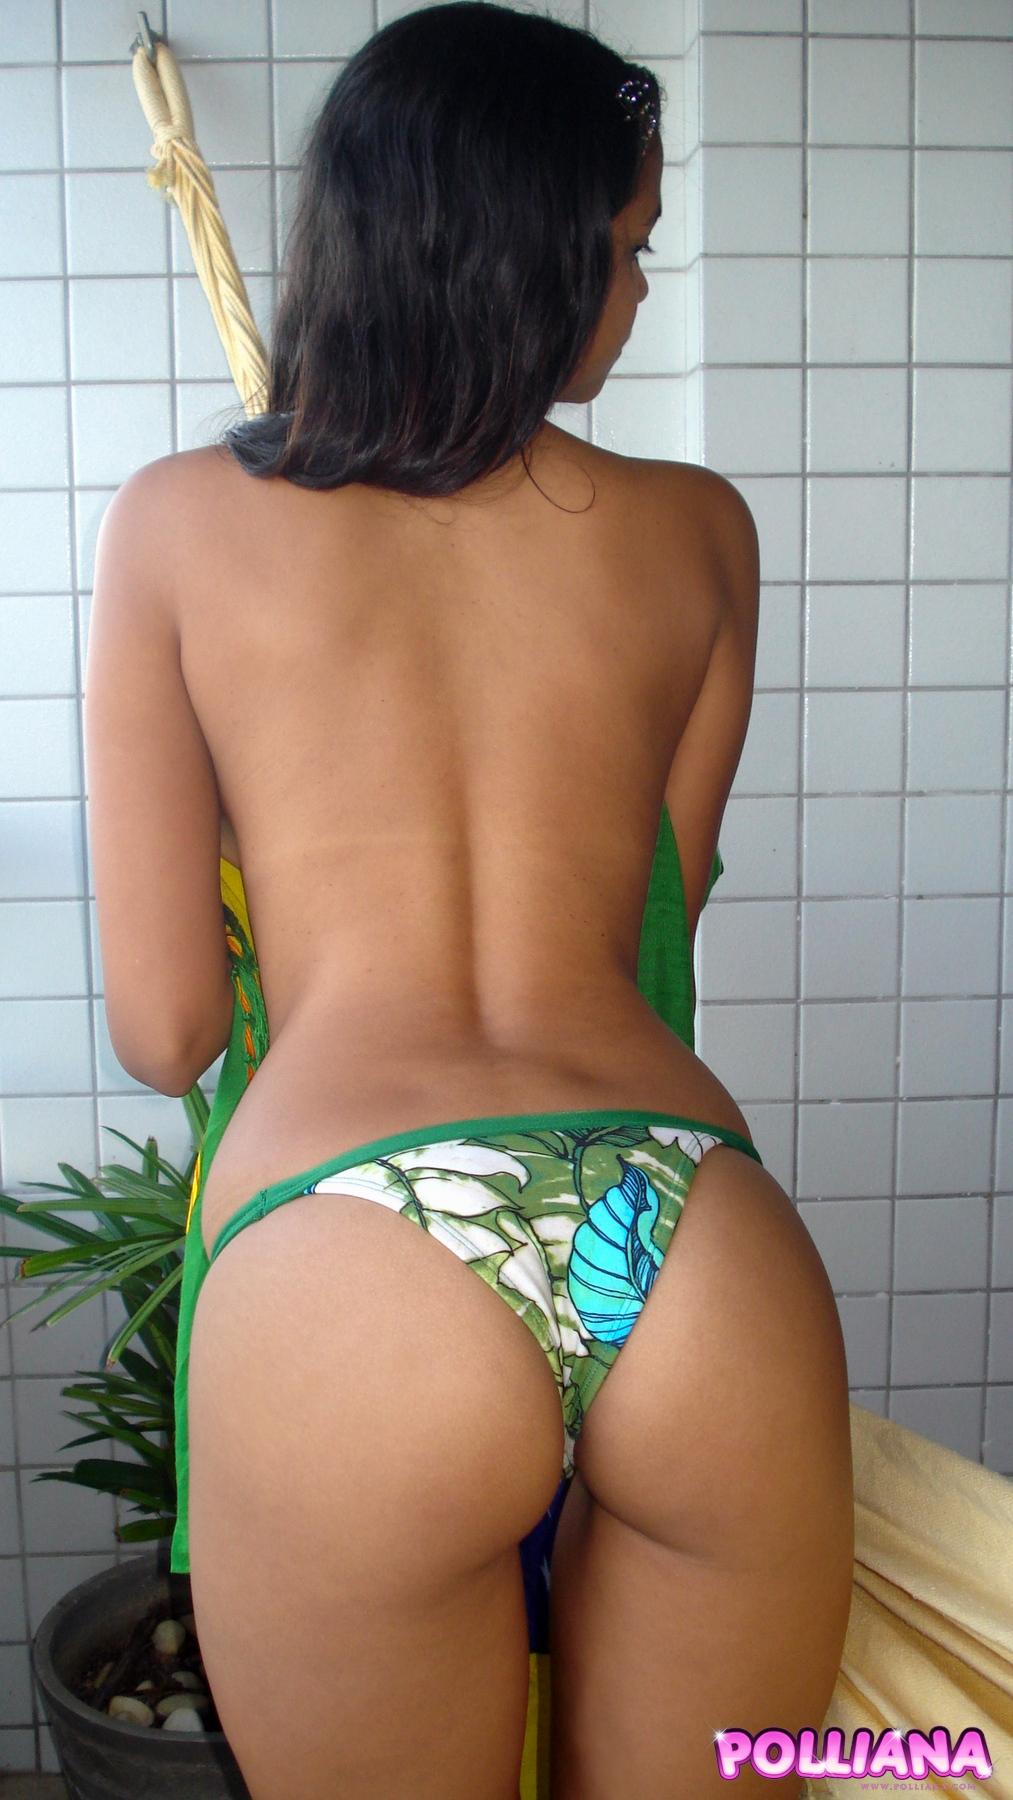 polliana-brazilbeachtowel2-8.jpg